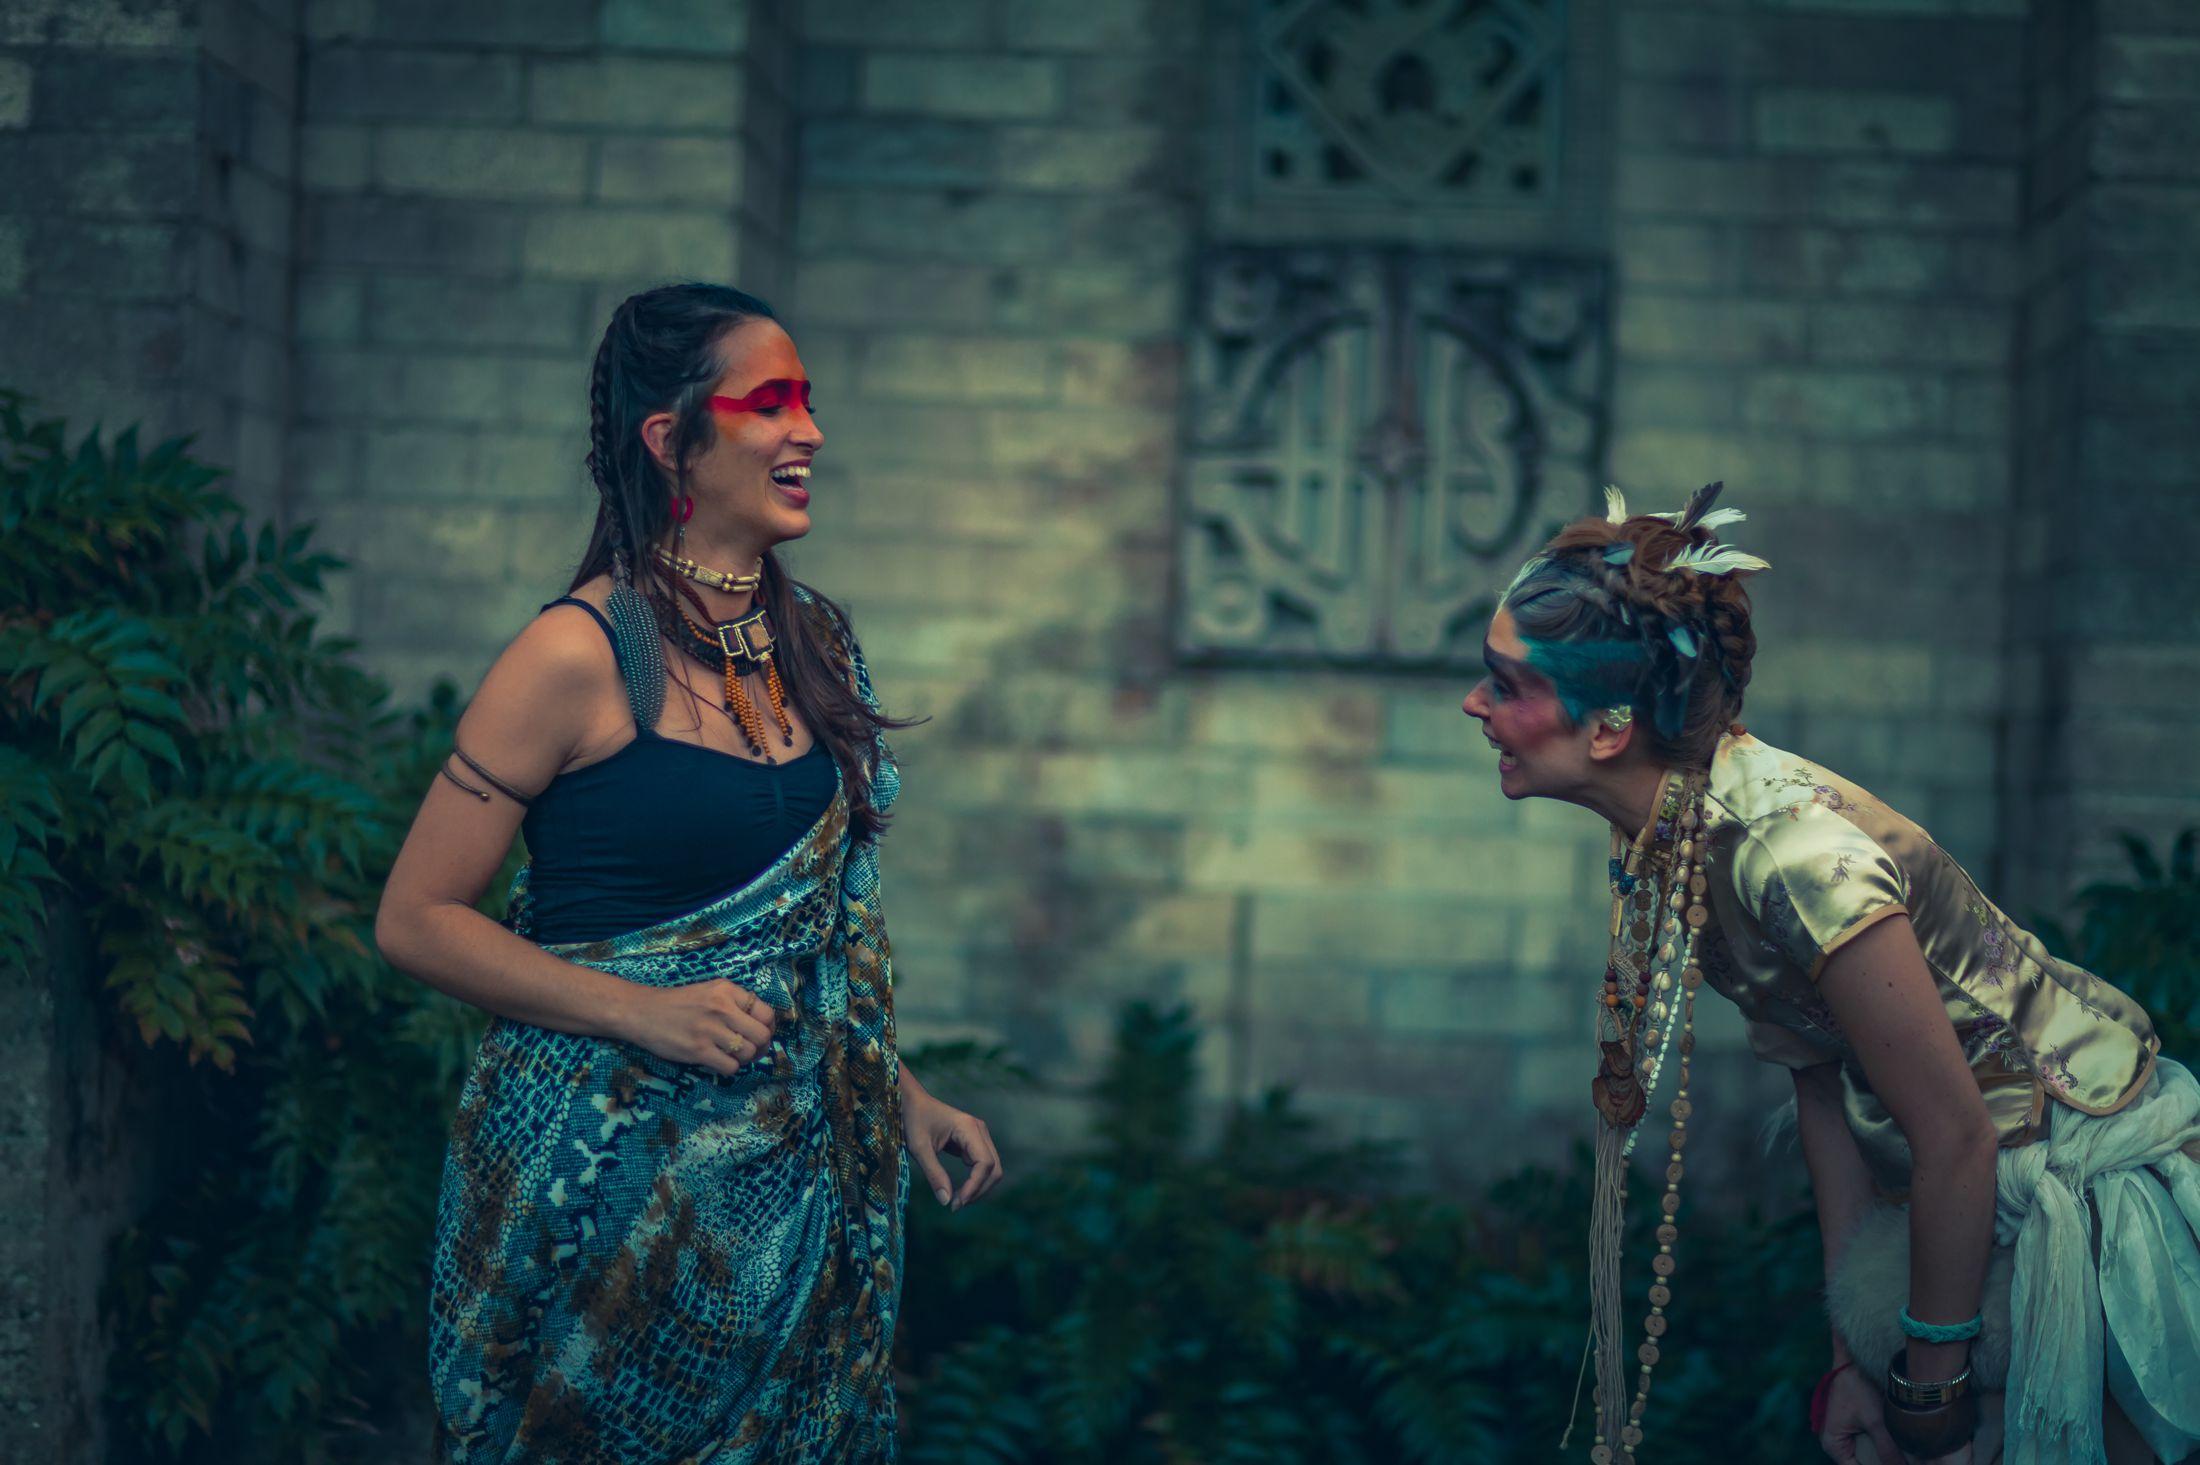 Electric Forest yoga LED light nomad festival style ethnic global fashion shoot warpaint tribal 20.jpg